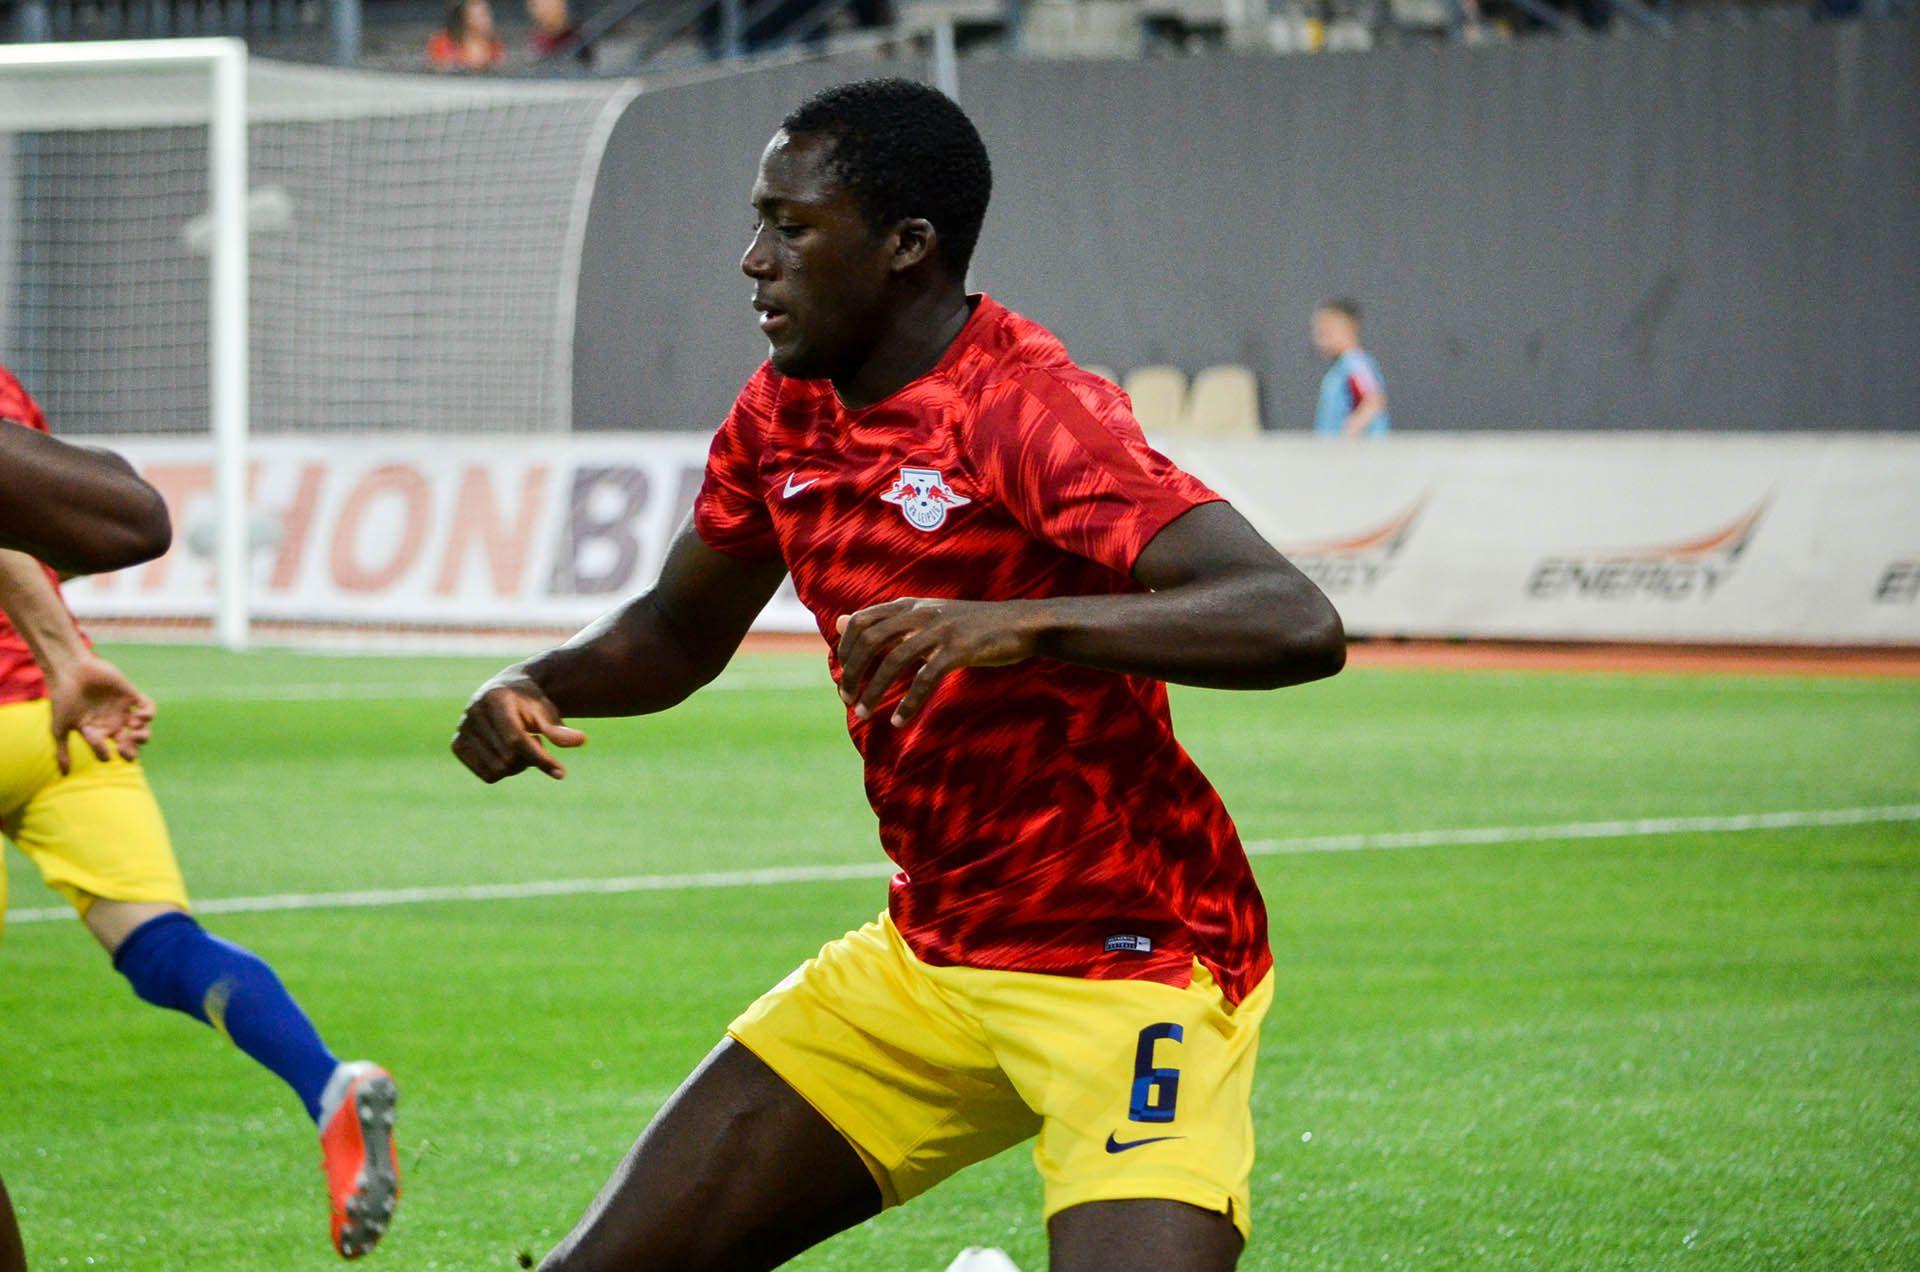 El francés Ibrahima Konate (Leipzig) USD 40 millones